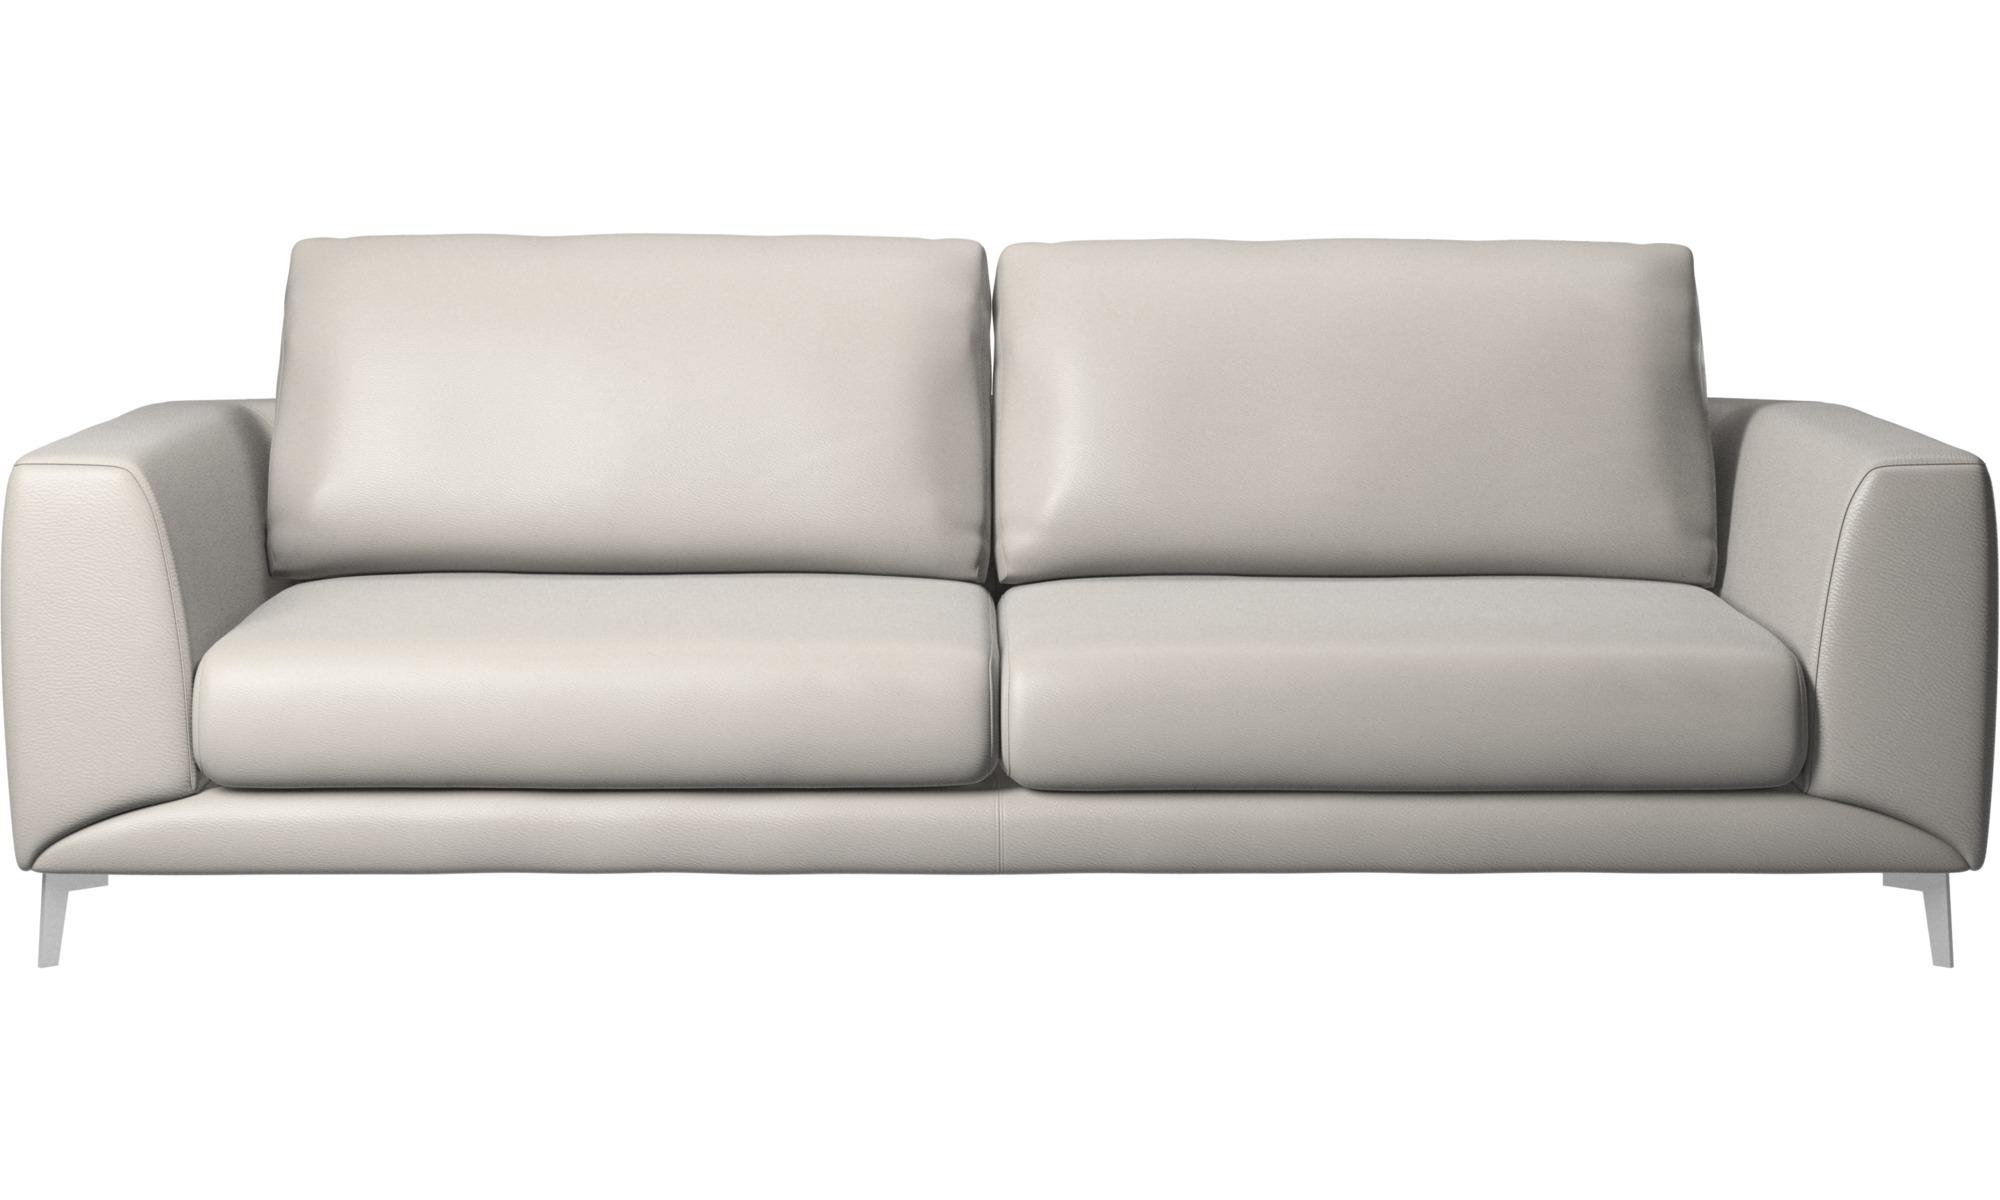 3 personers sofaer - Fargo sofa - Grå - Læder